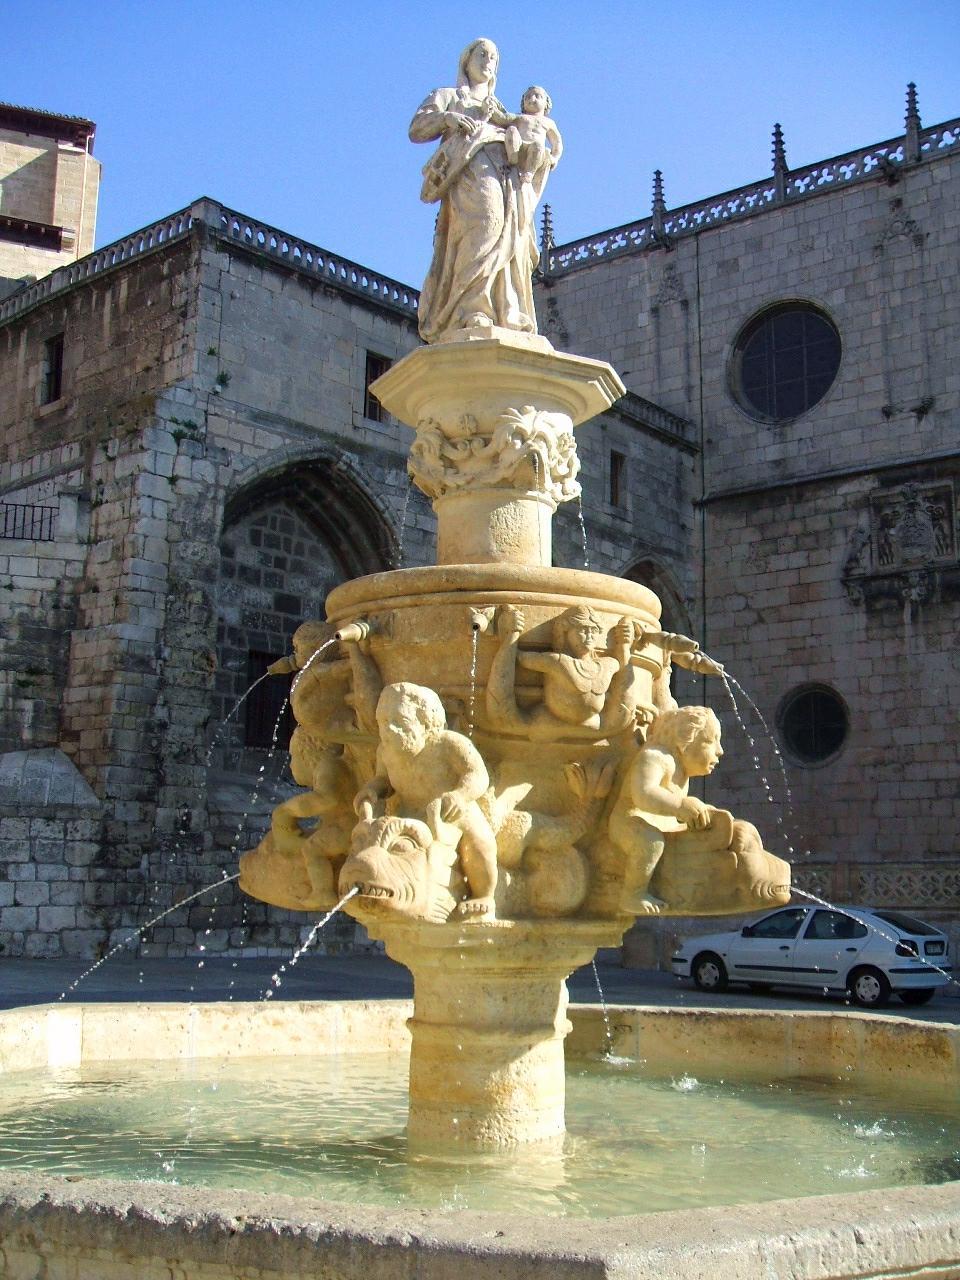 File:Burgos - Catedral 020 - Plaza de Santa Maria.JPG - Wikimedia Commons